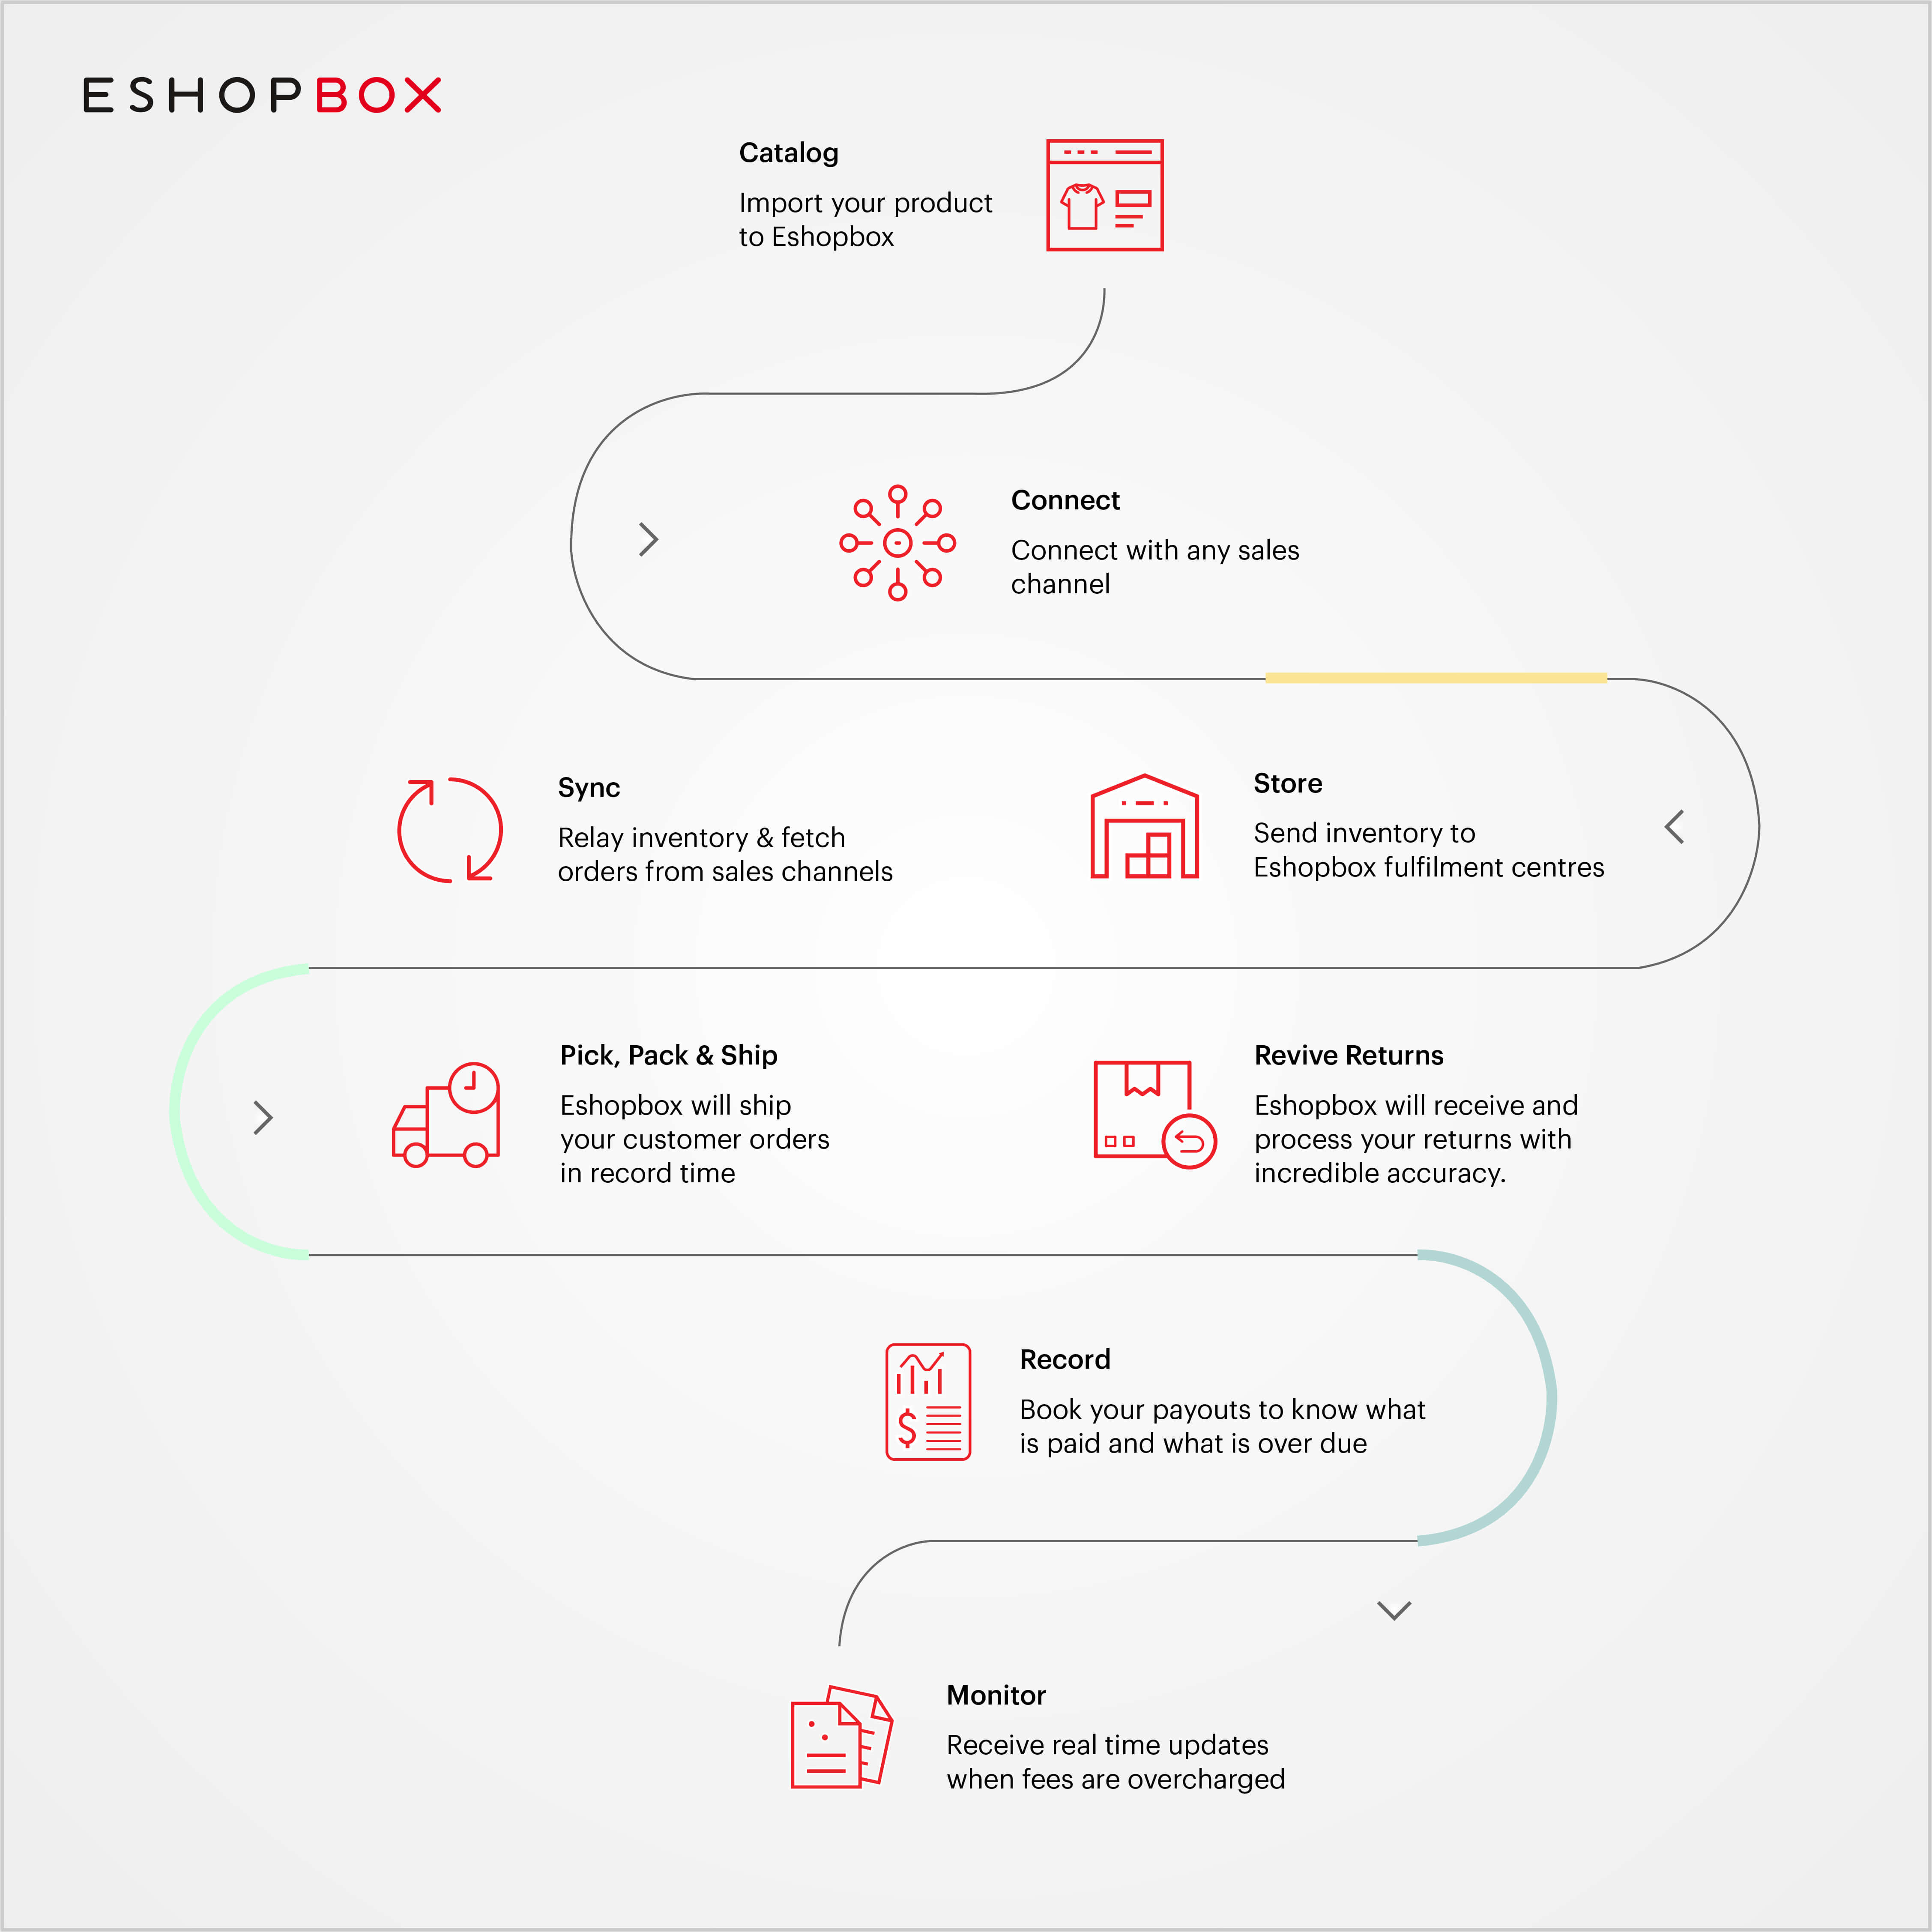 Eshopbox ecommerce workflow